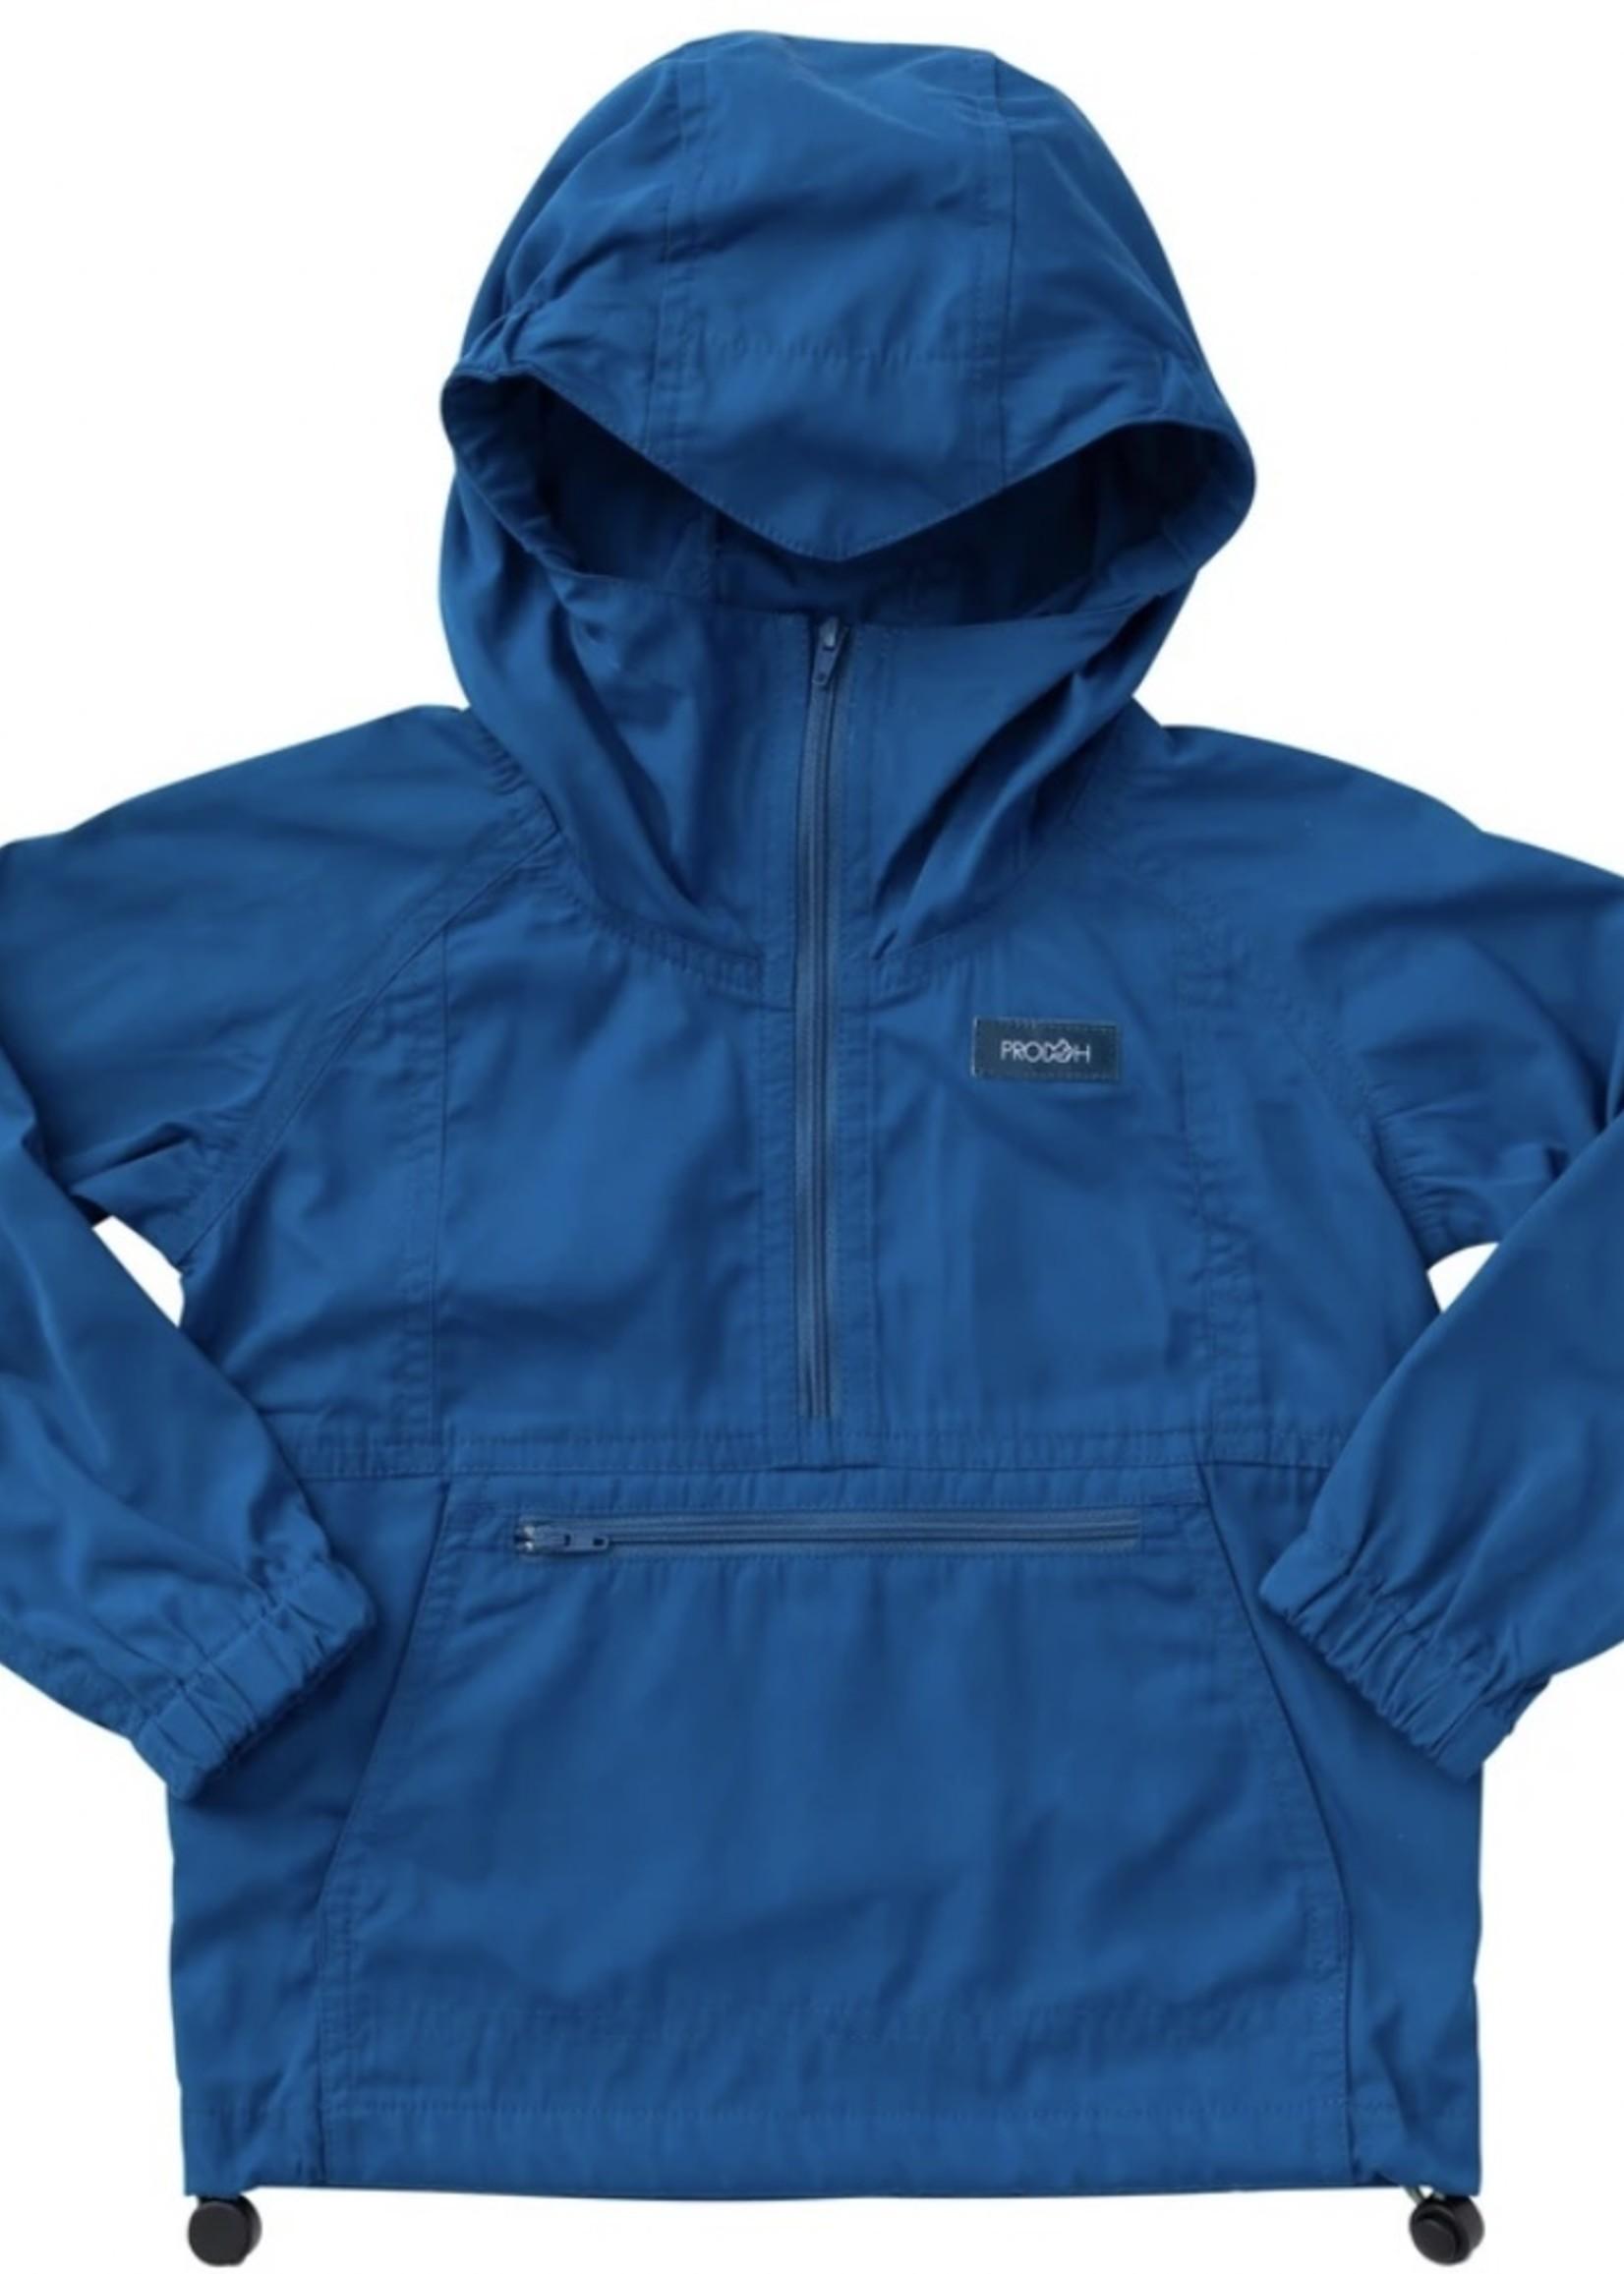 Anorak Pullover Jacket - Blueberry Pie